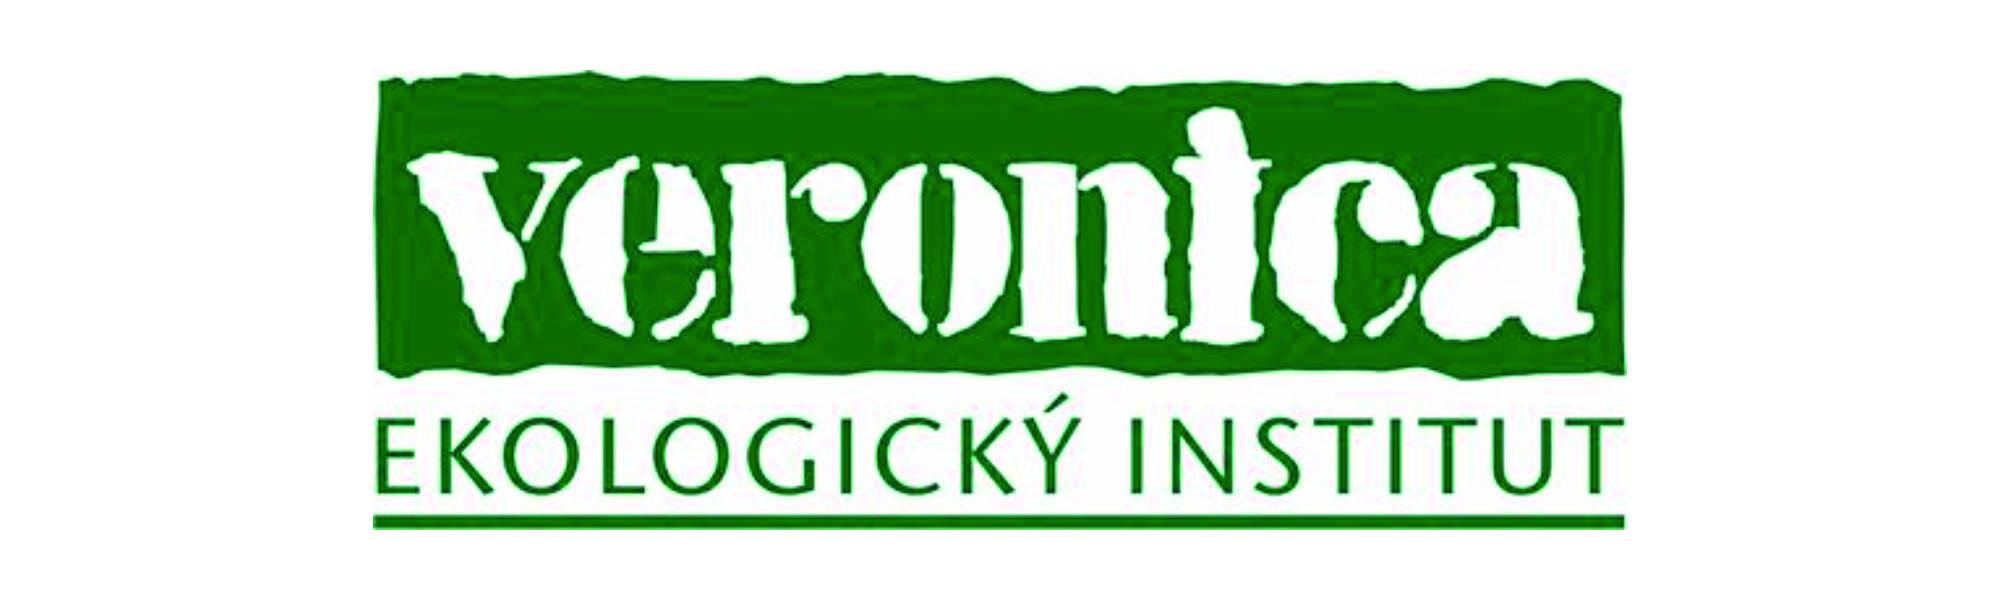 Ekologický institut Veronica